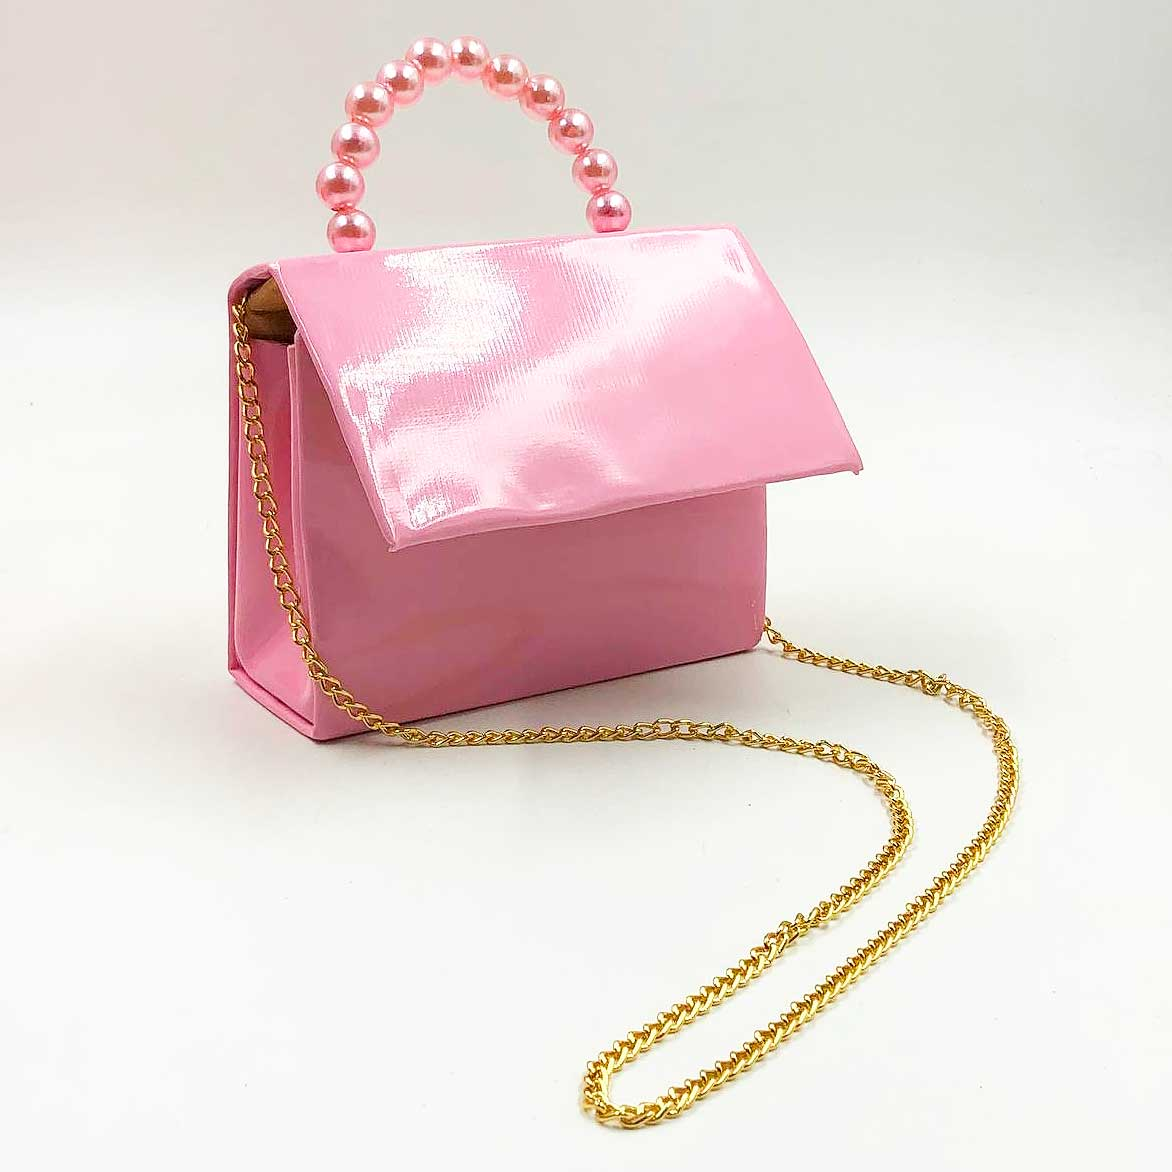 Bolsa Infantil Envernizada - Rosa Claro